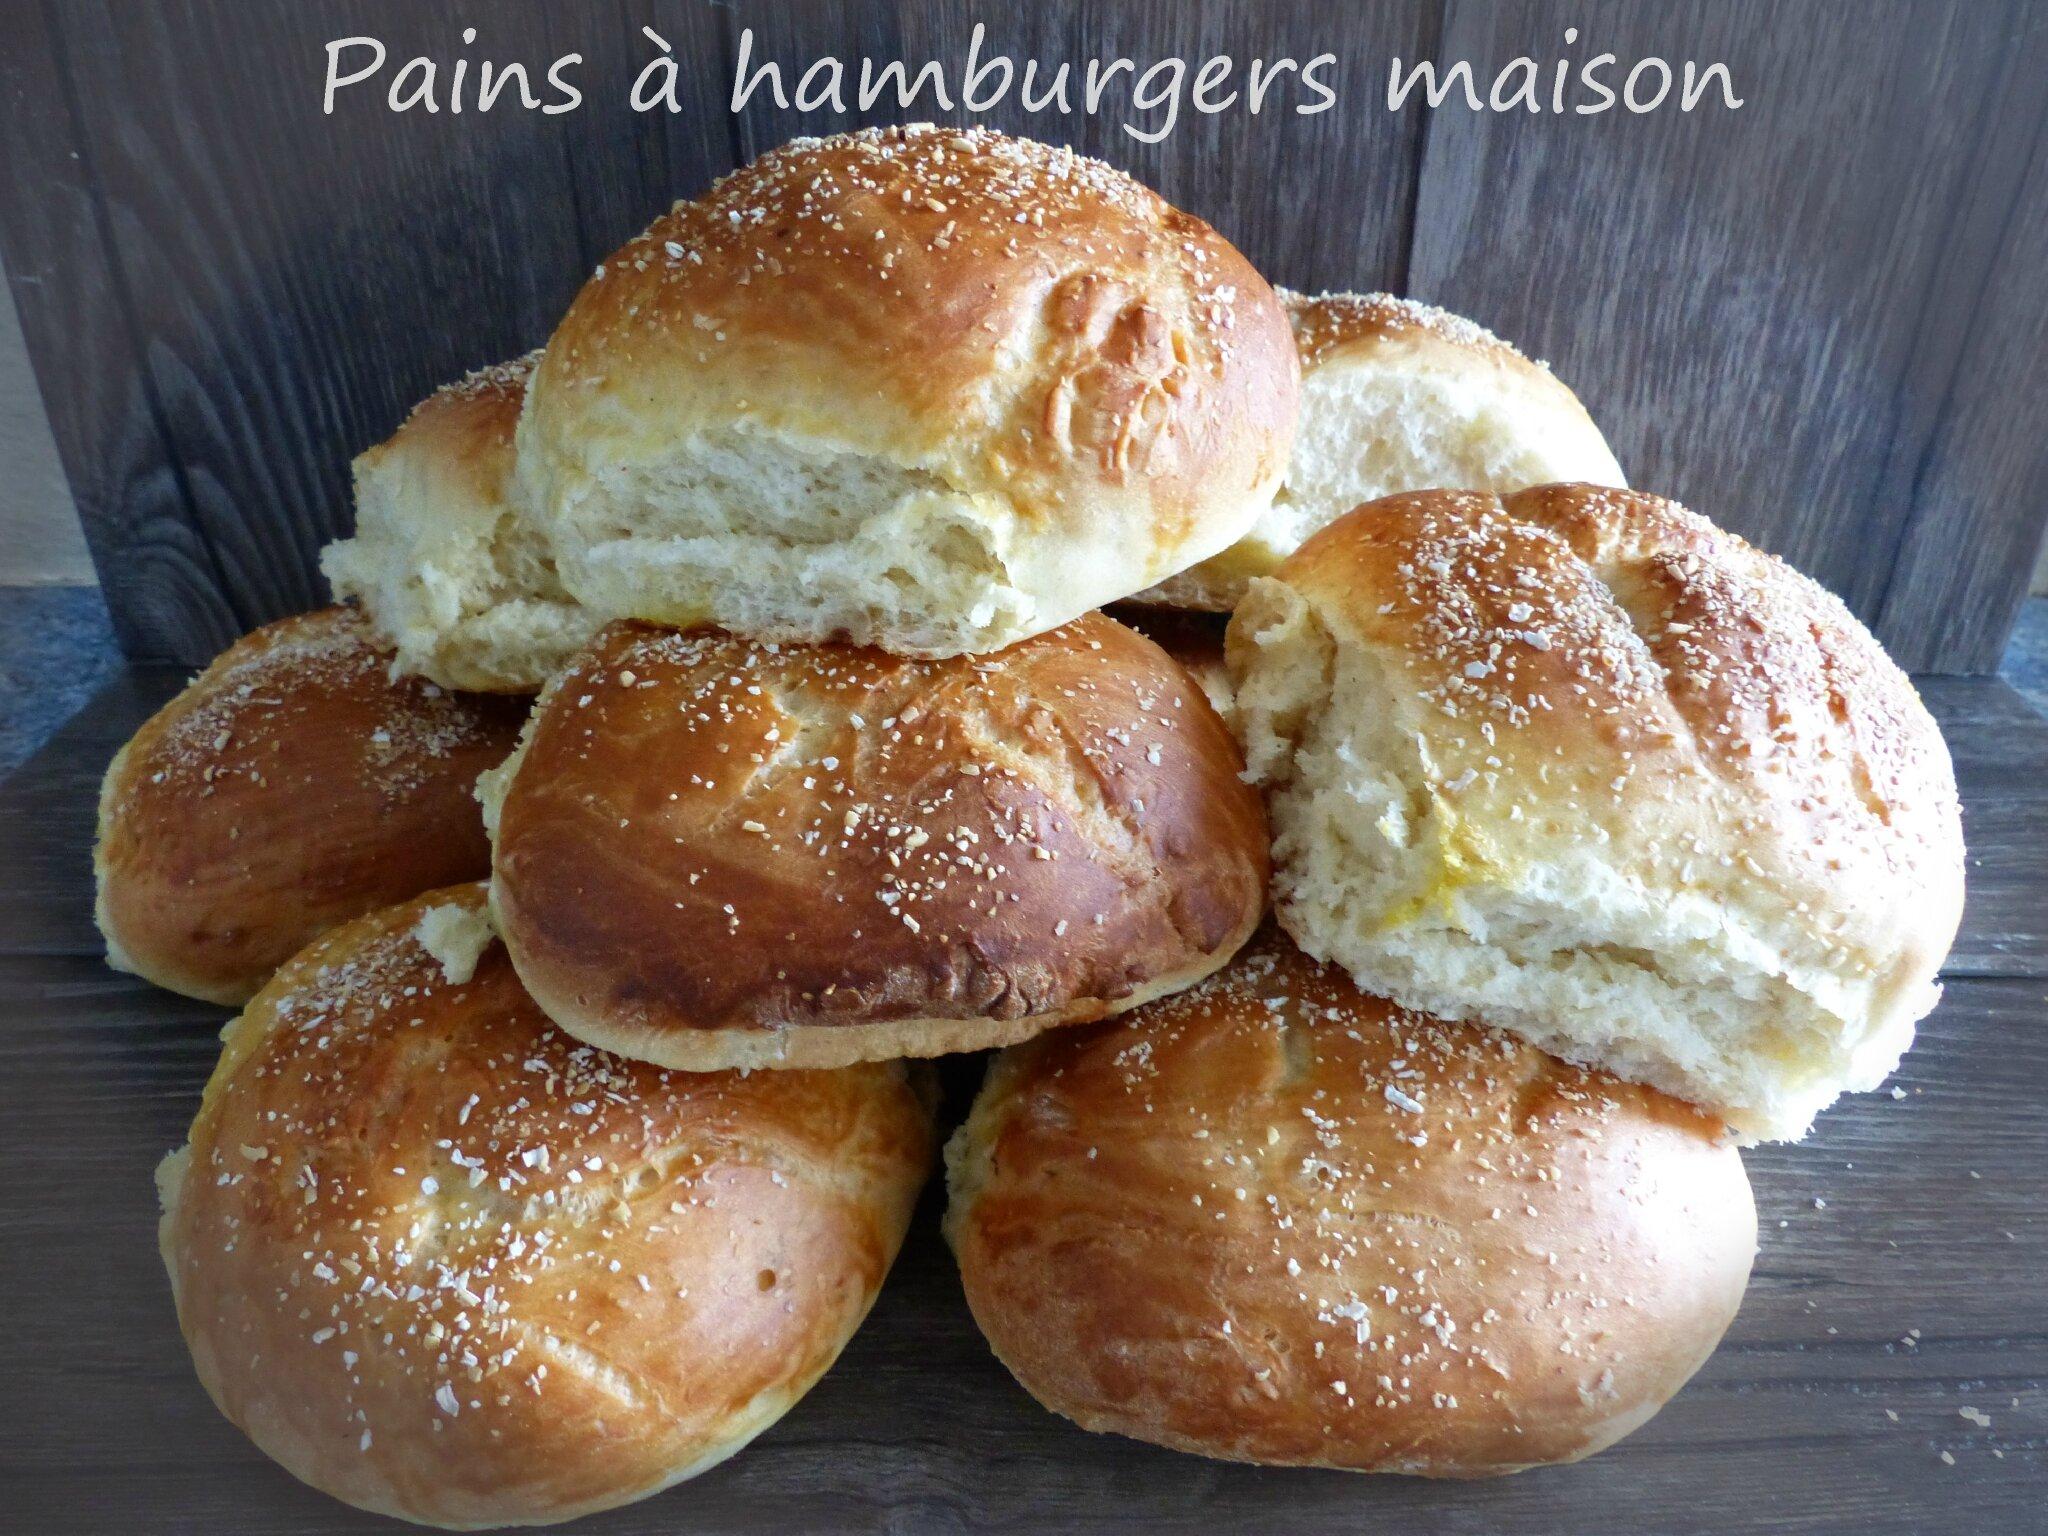 Pains à hamburgers